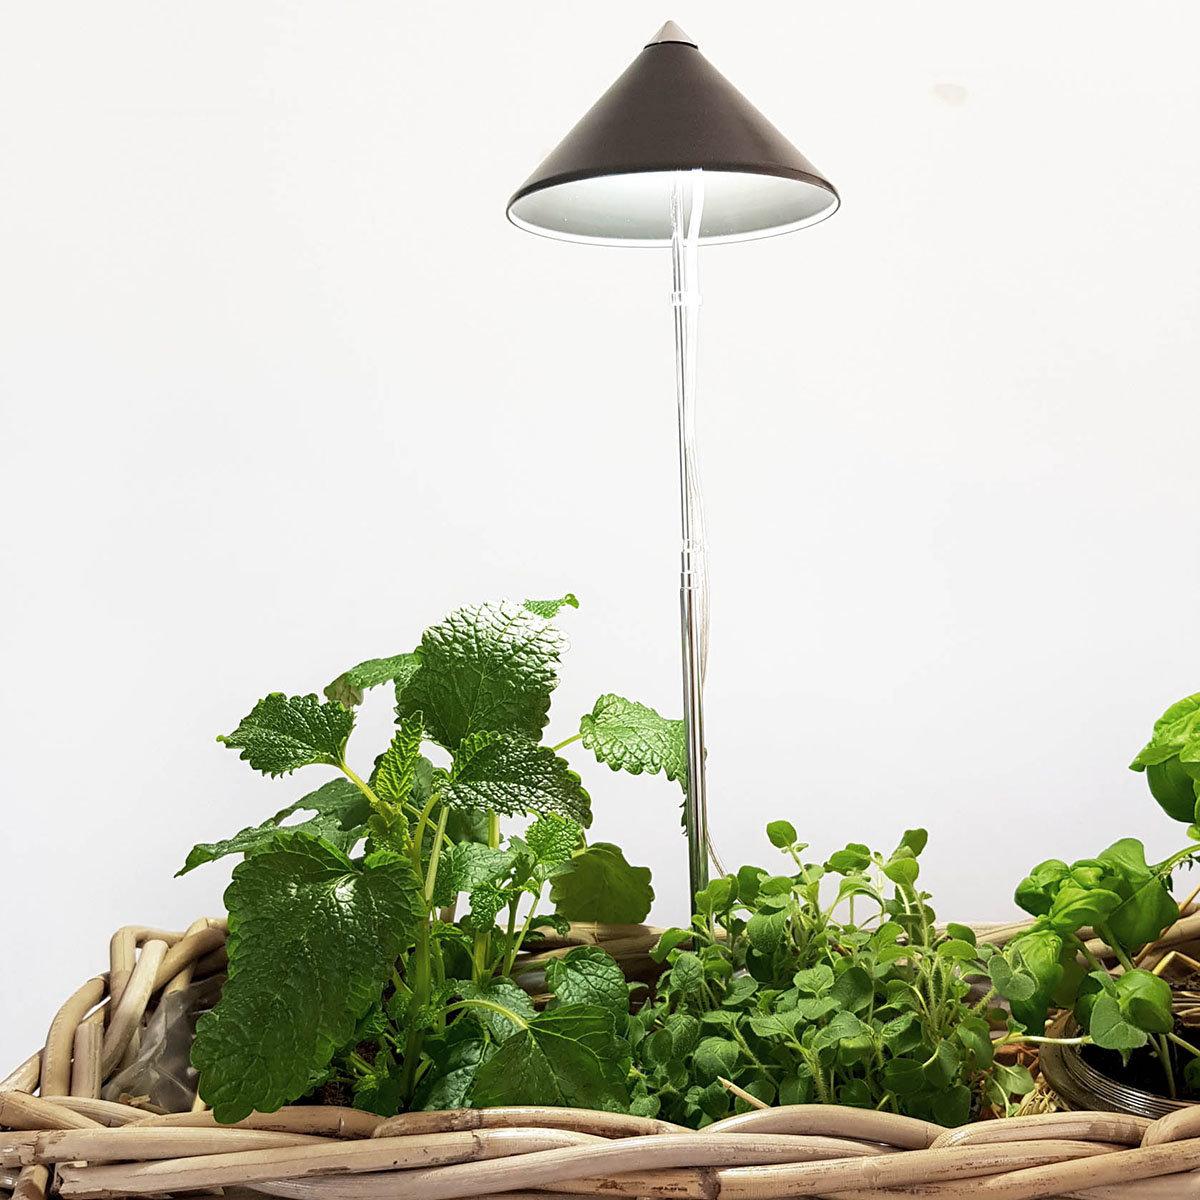 Sunlite Pflanzenlampe, 7 W, 28-100 cm, Ø 11, Kabel 4 m,Aluminium, grau